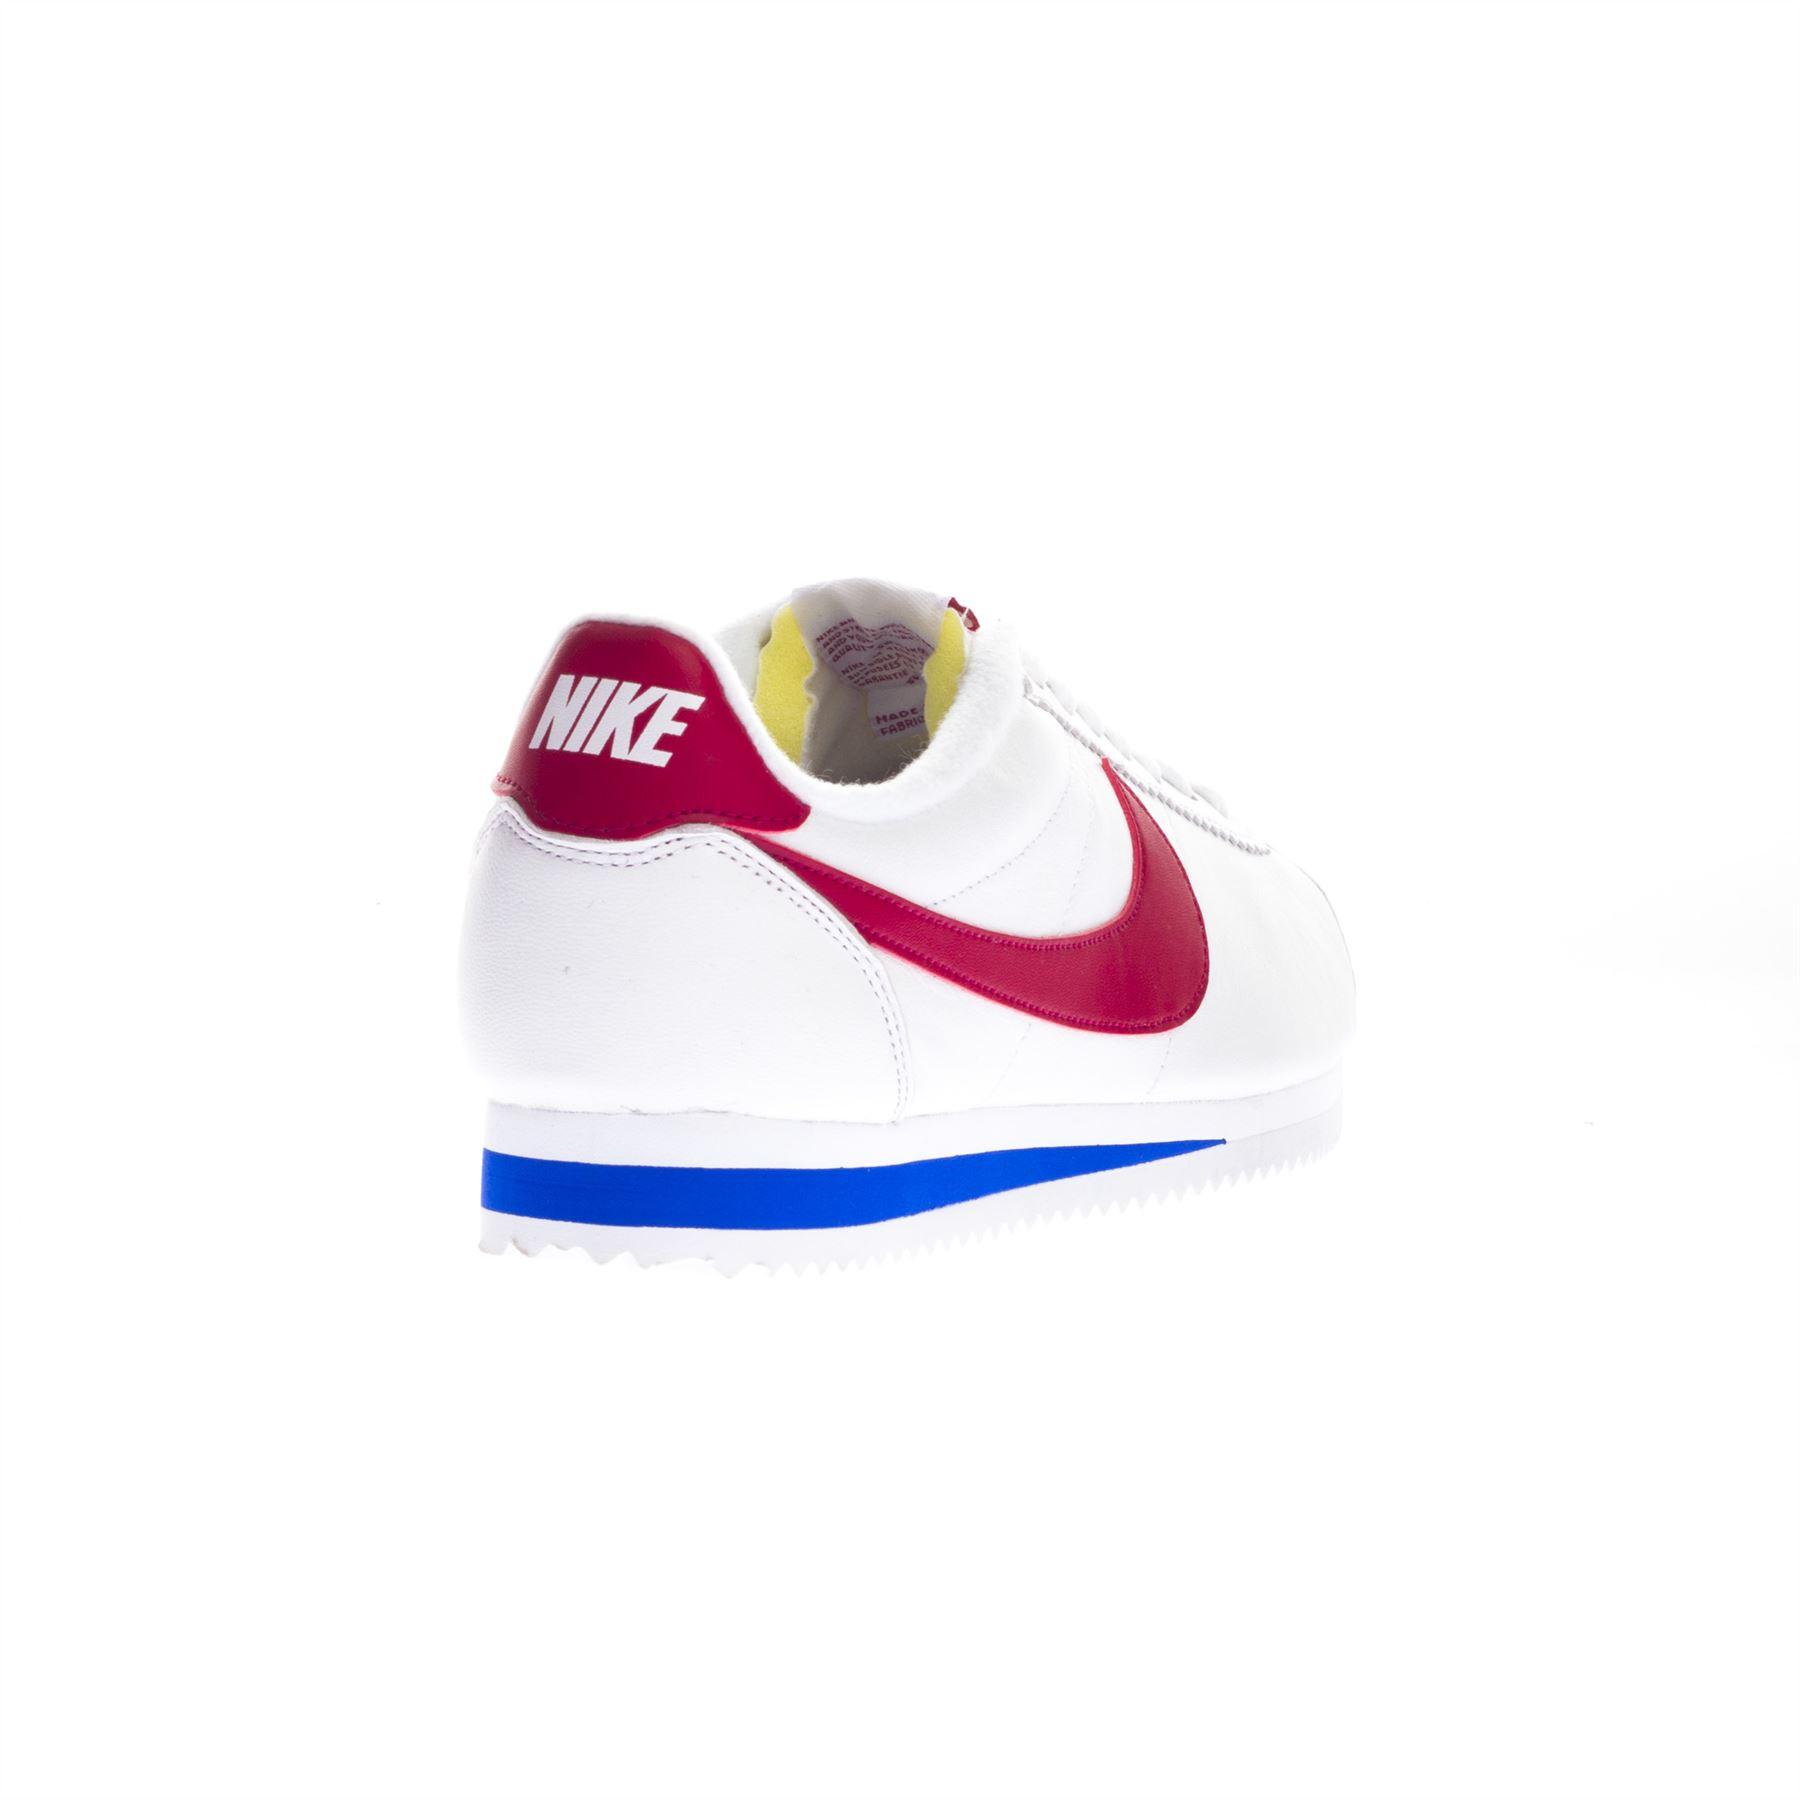 Nike Men's Cortez Classic Basic Prem QS Low Top Running